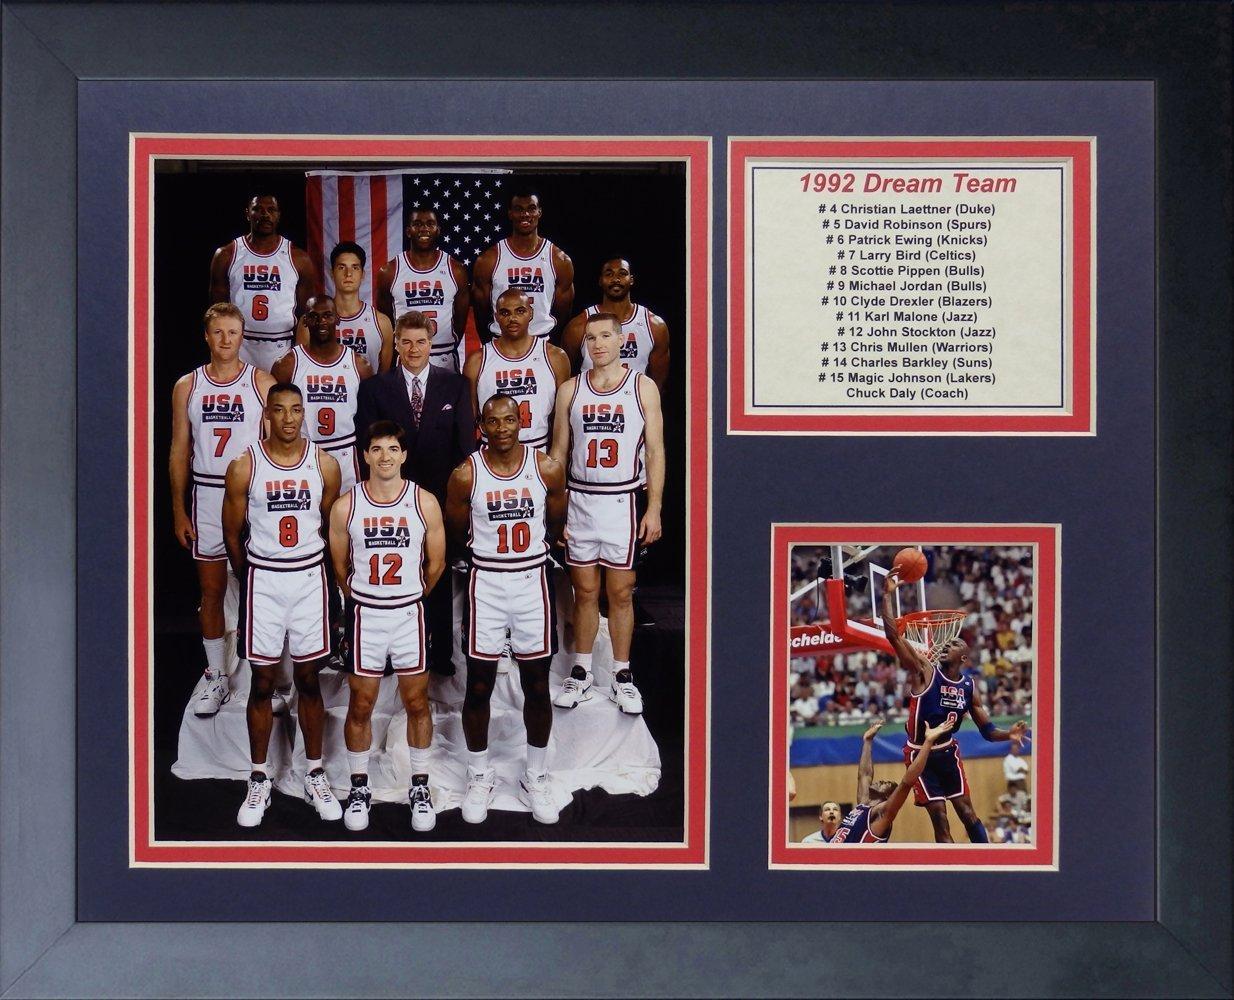 b2b7aea0141c 1992 USA BASKETBALL DREAM TEAM MICHAEL JORDAN LARRY BIRD MAGIC 8X10 PHOTO  FRAMED at Amazon s Sports Collectibles Store